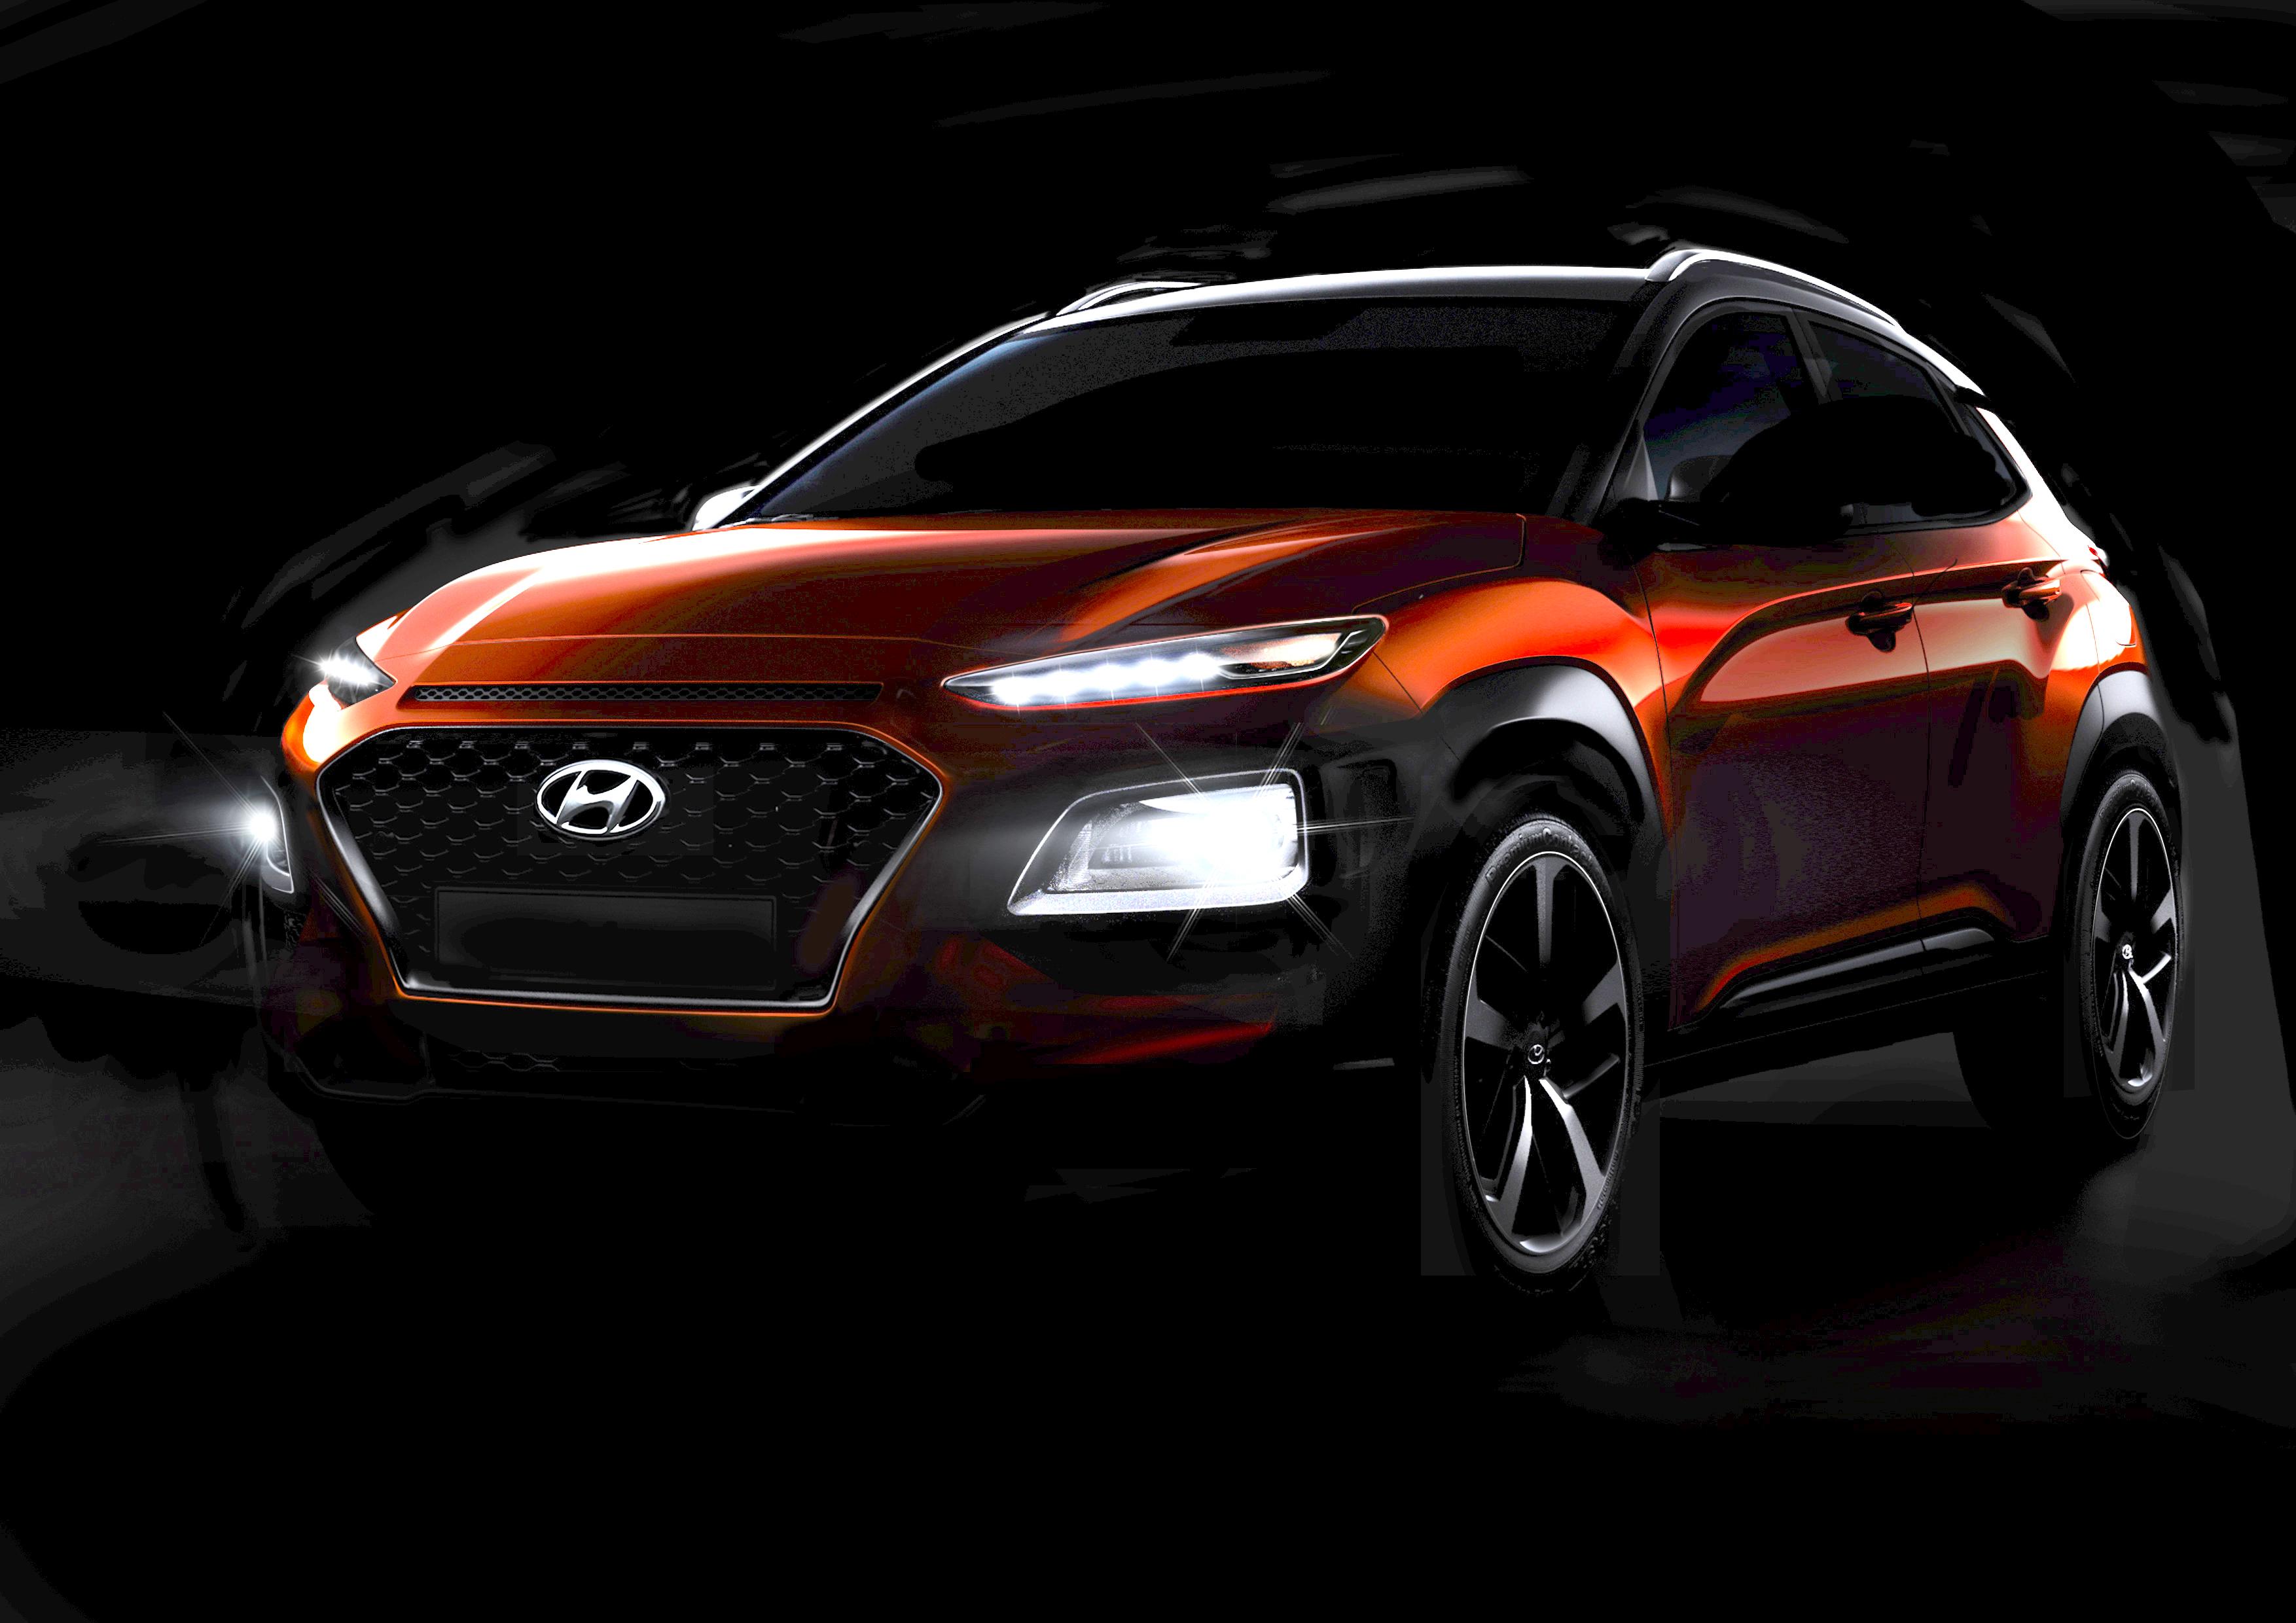 News Hyundai Reveals Kona Crossover Less Teasingly